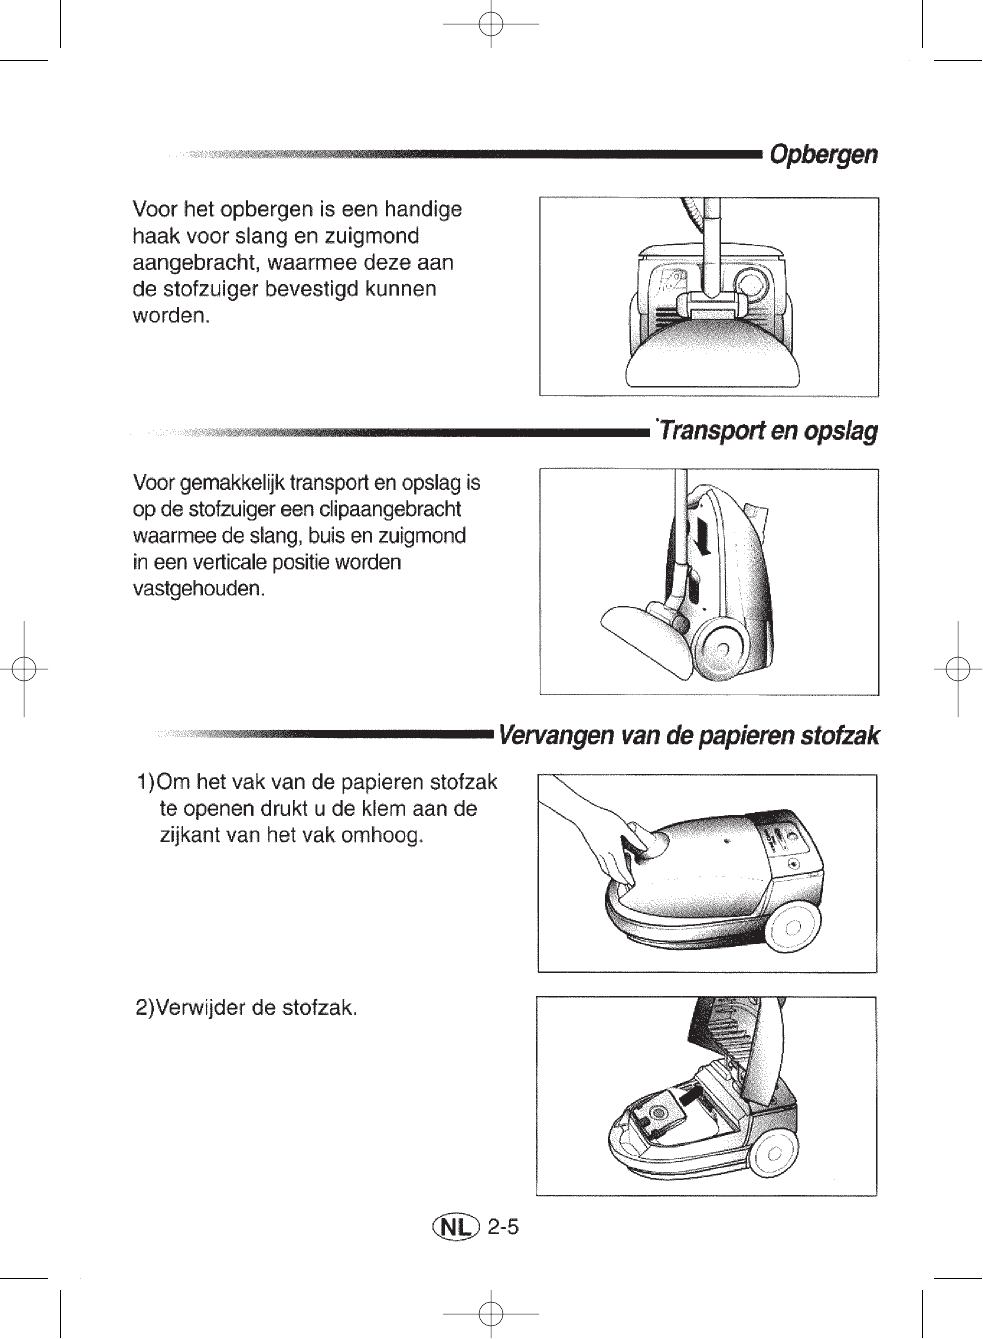 Handleiding Samsung Rc 5510 Pagina 13 Van 24 English Français